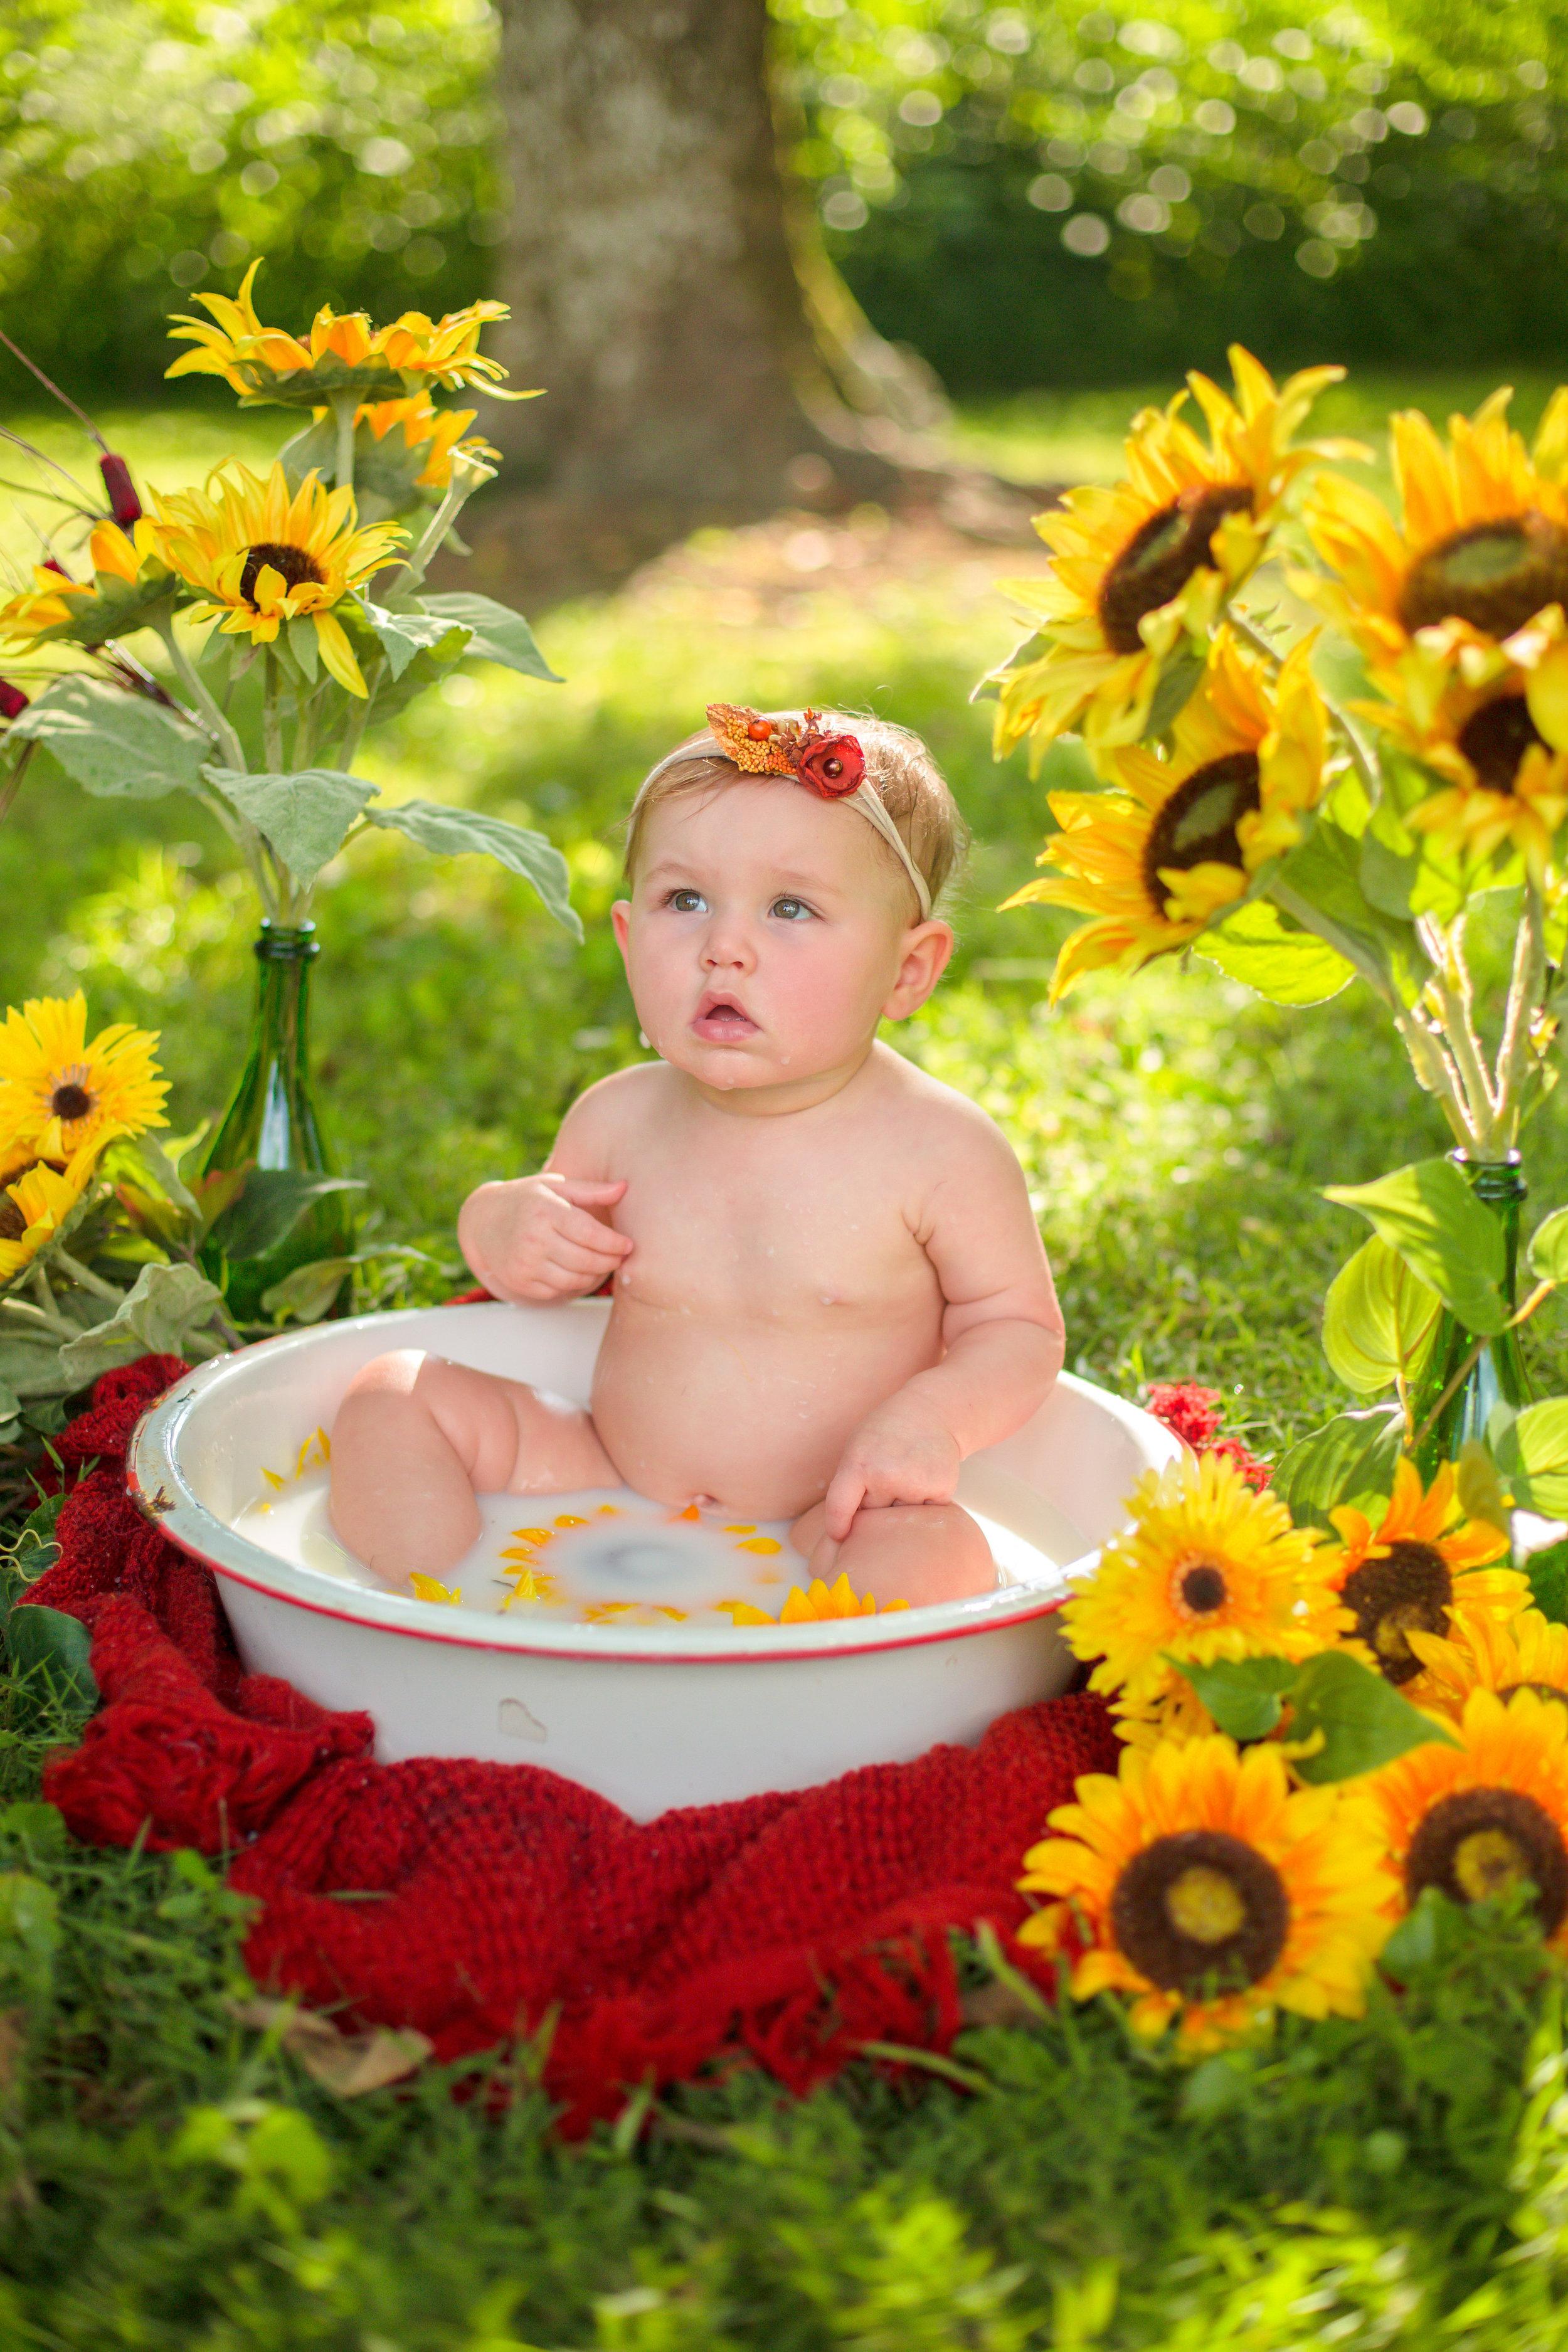 Sawyer-Jo-Sunflower-Milk-bath-Nashville-Family-Photographer-Chelsea-Meadows-Photography-(36).jpg